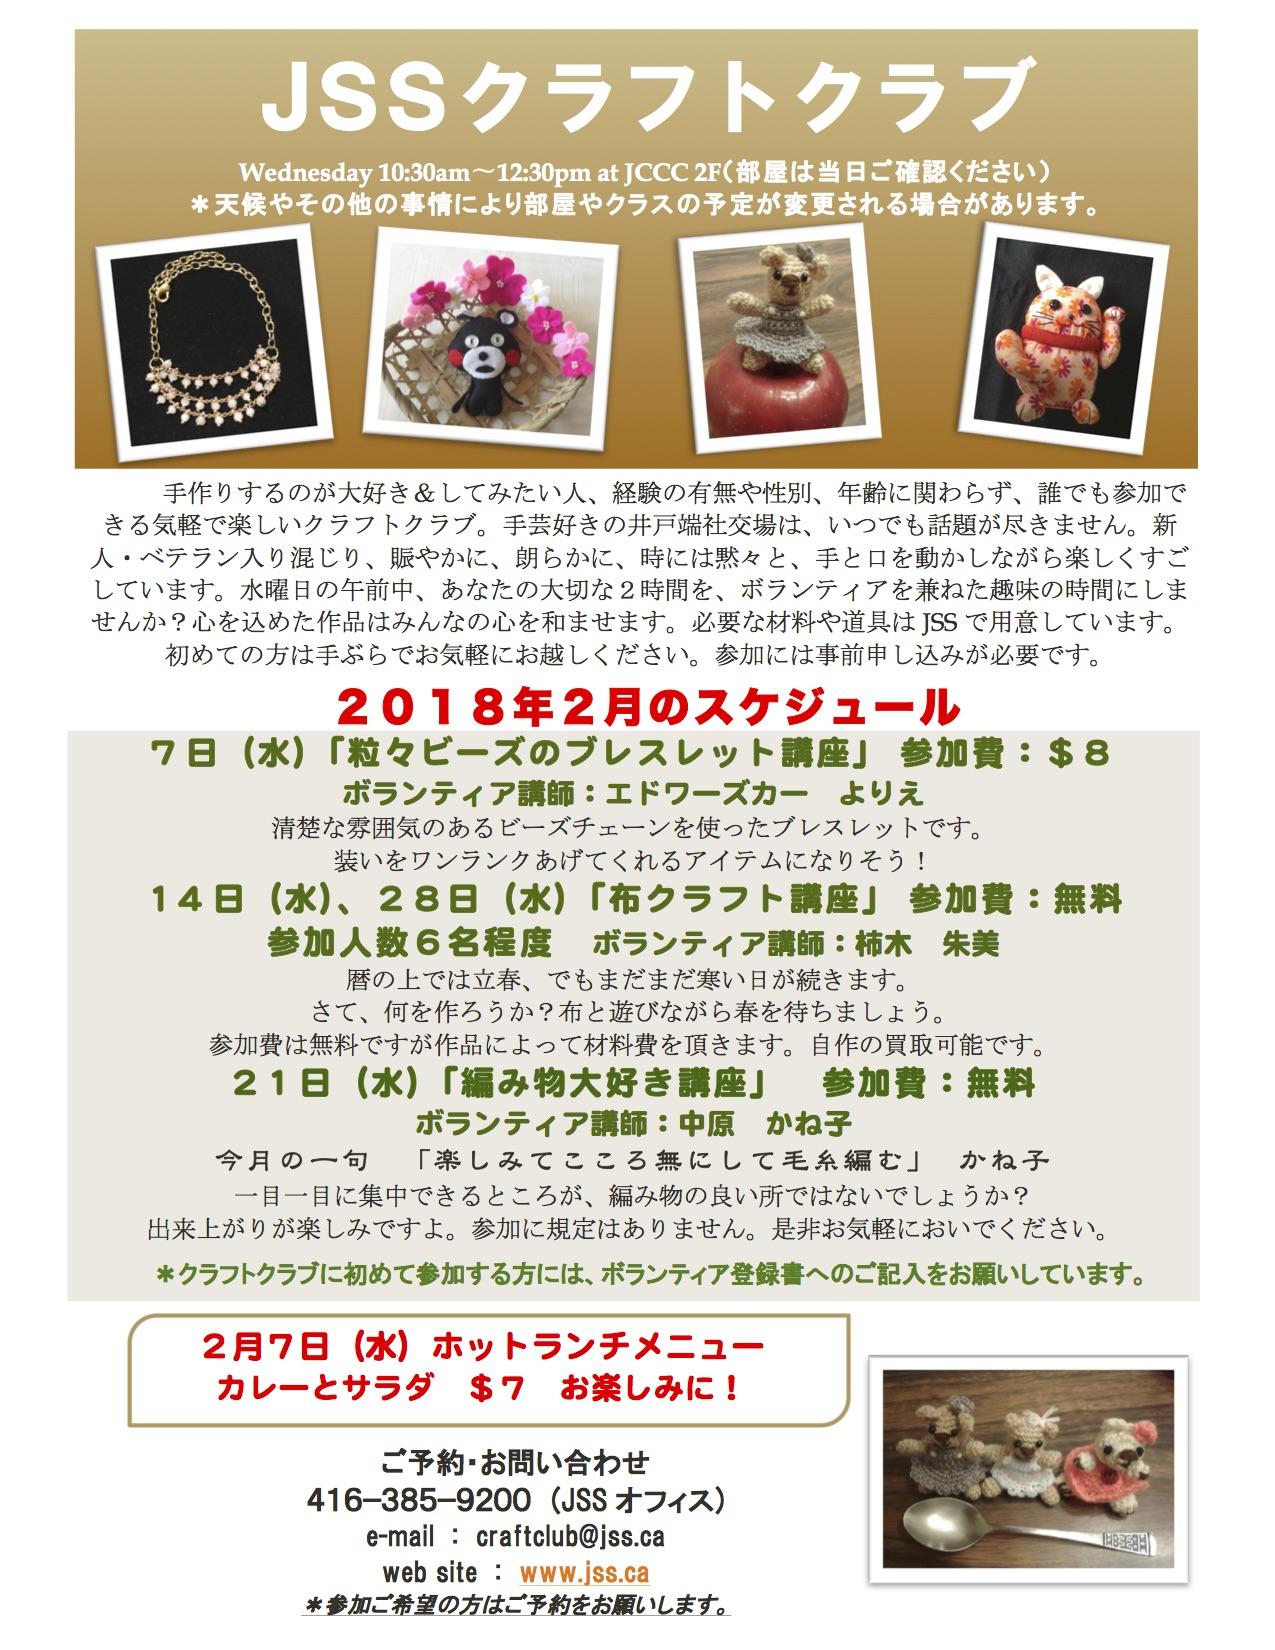 [:ja]JSS クラフトクラブ 2月の予定[:en]JSS Craft Club Schedule - February[:]